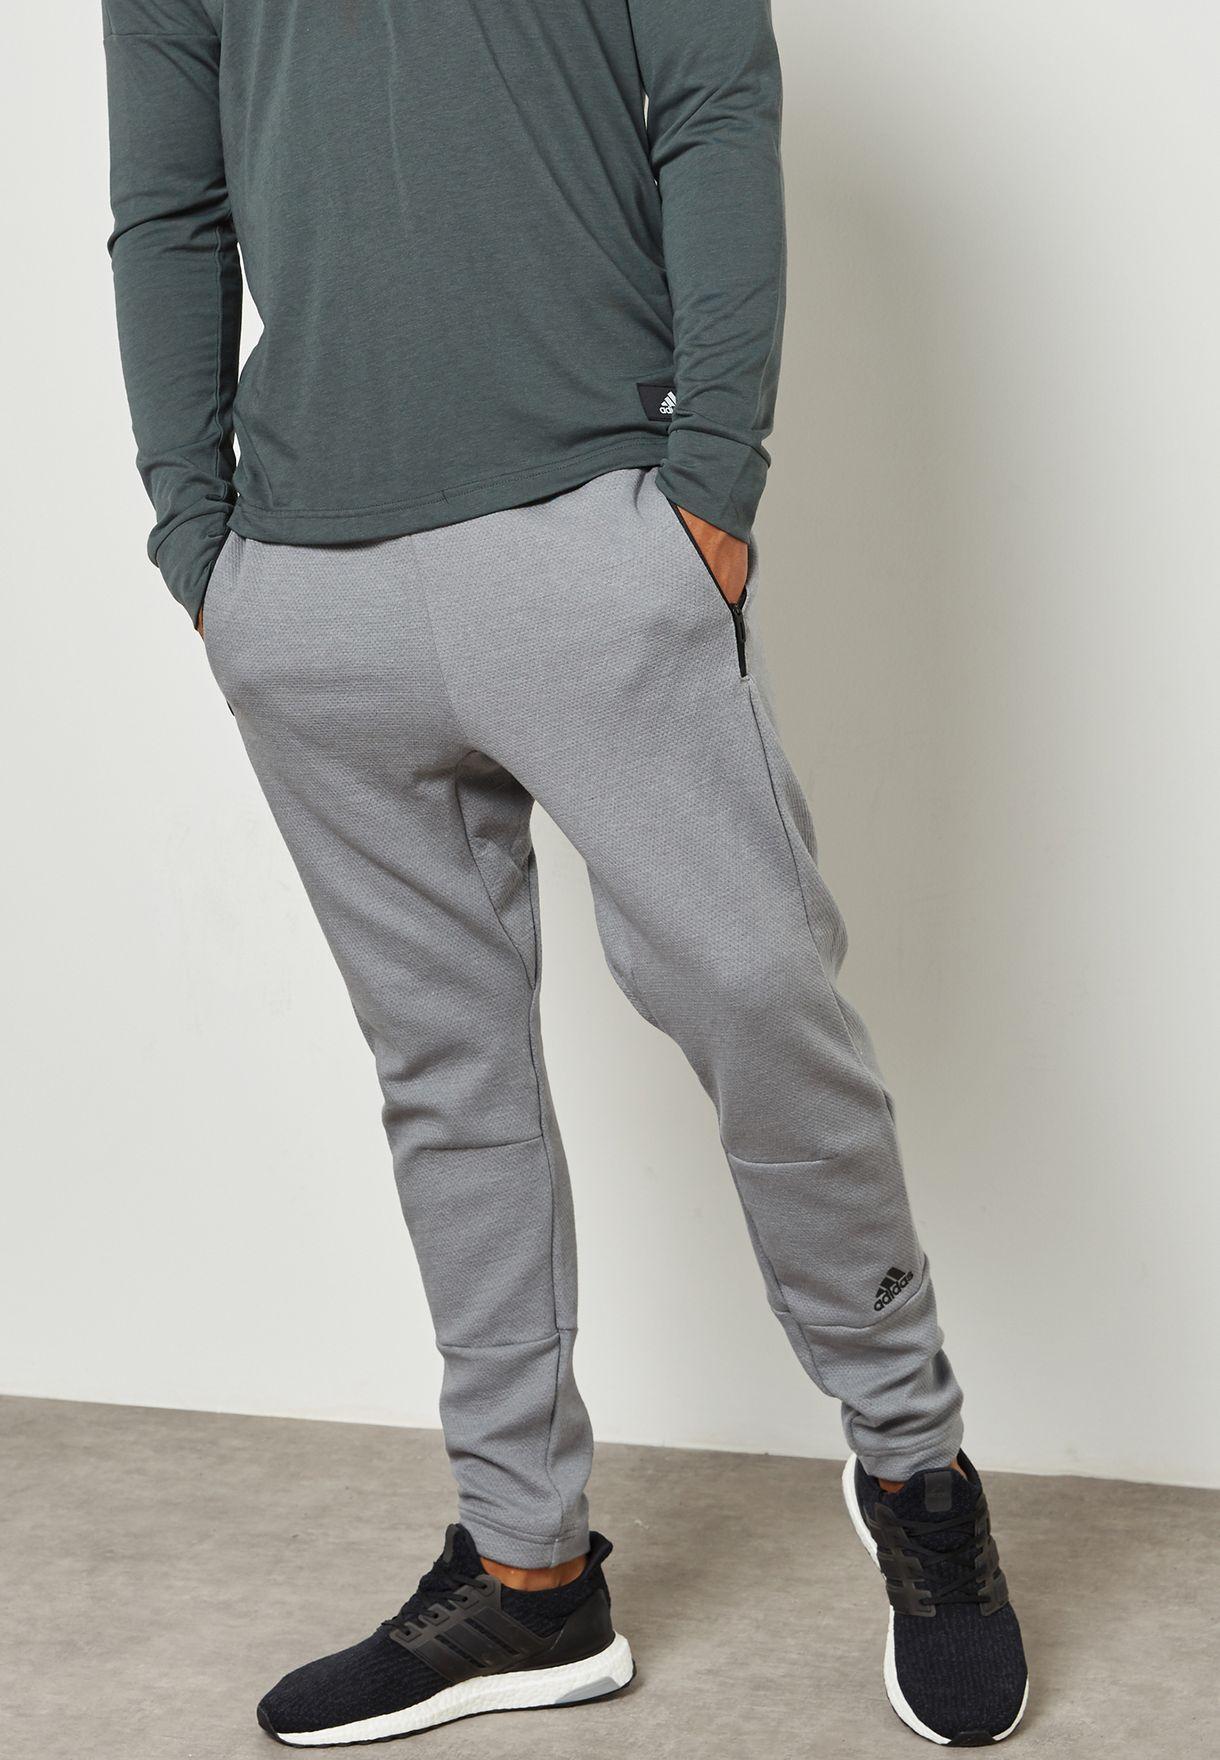 898a1a2da Shop adidas grey ID Champ Sweatpants BP6626 for Men in Saudi ...